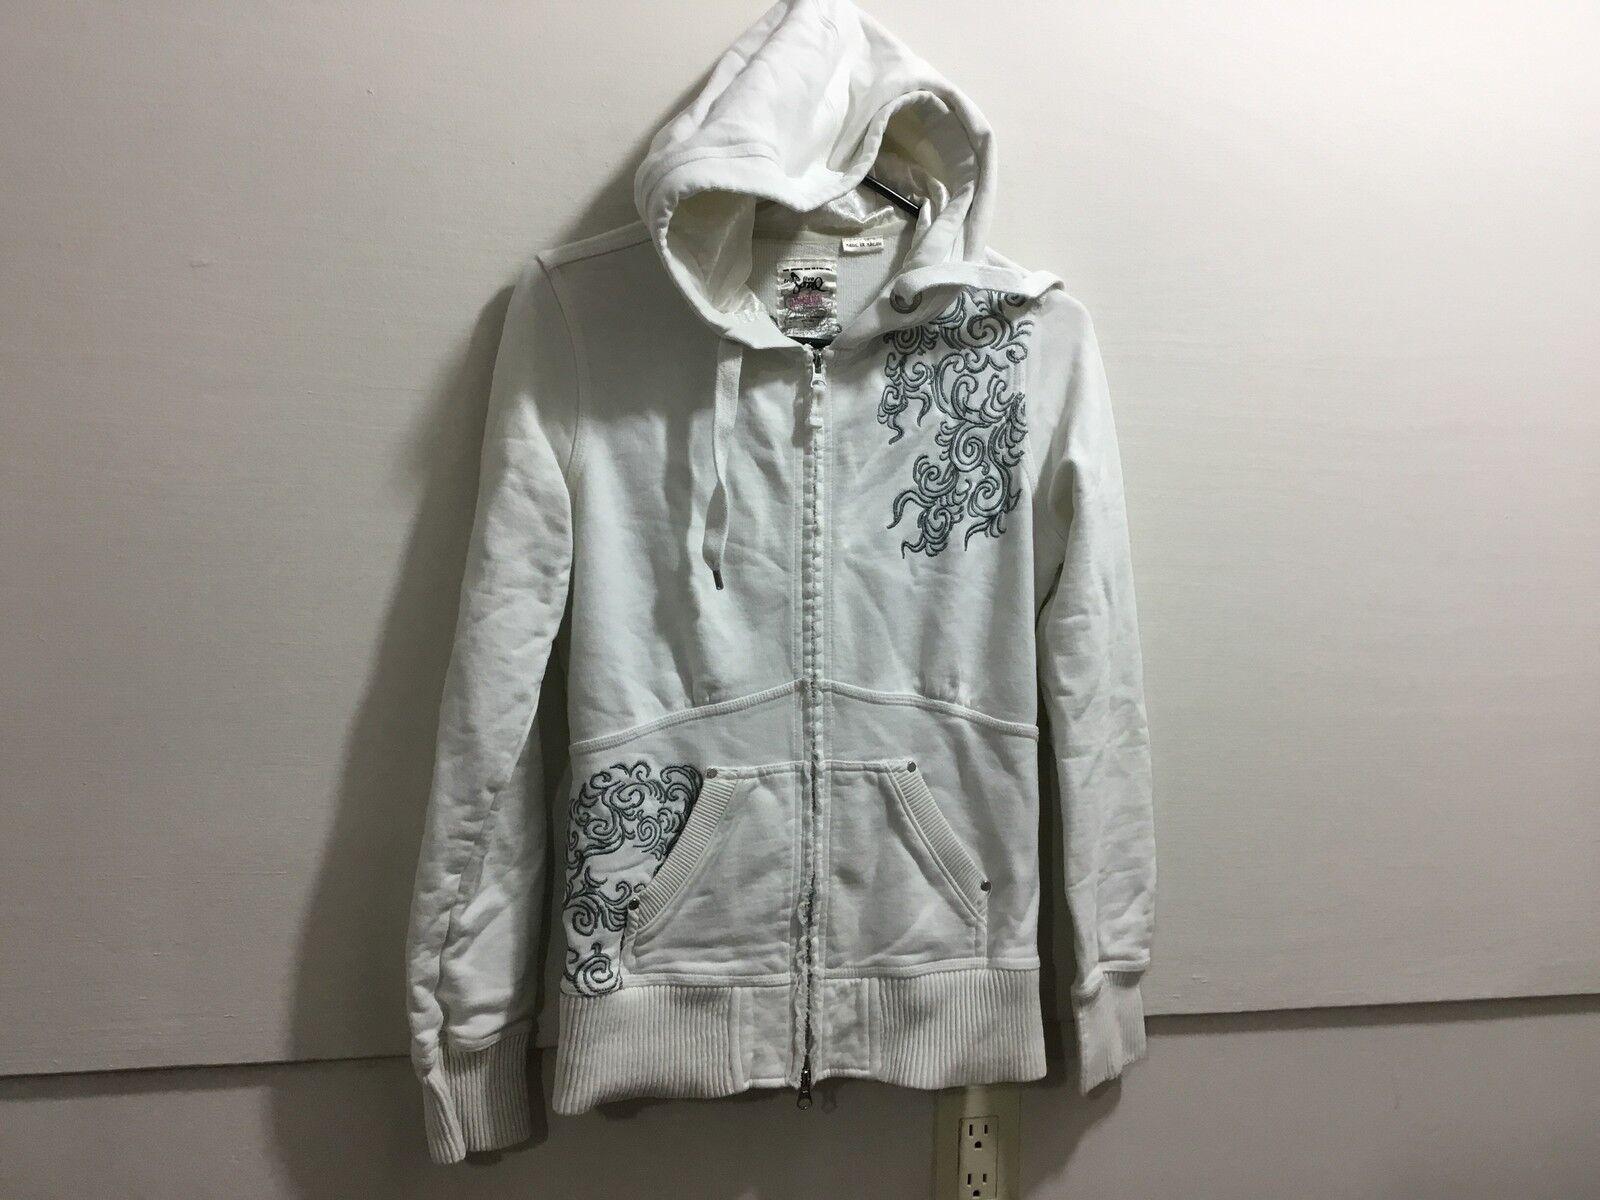 Ladies size medium embroided detail zipper front hooded sweatshirt